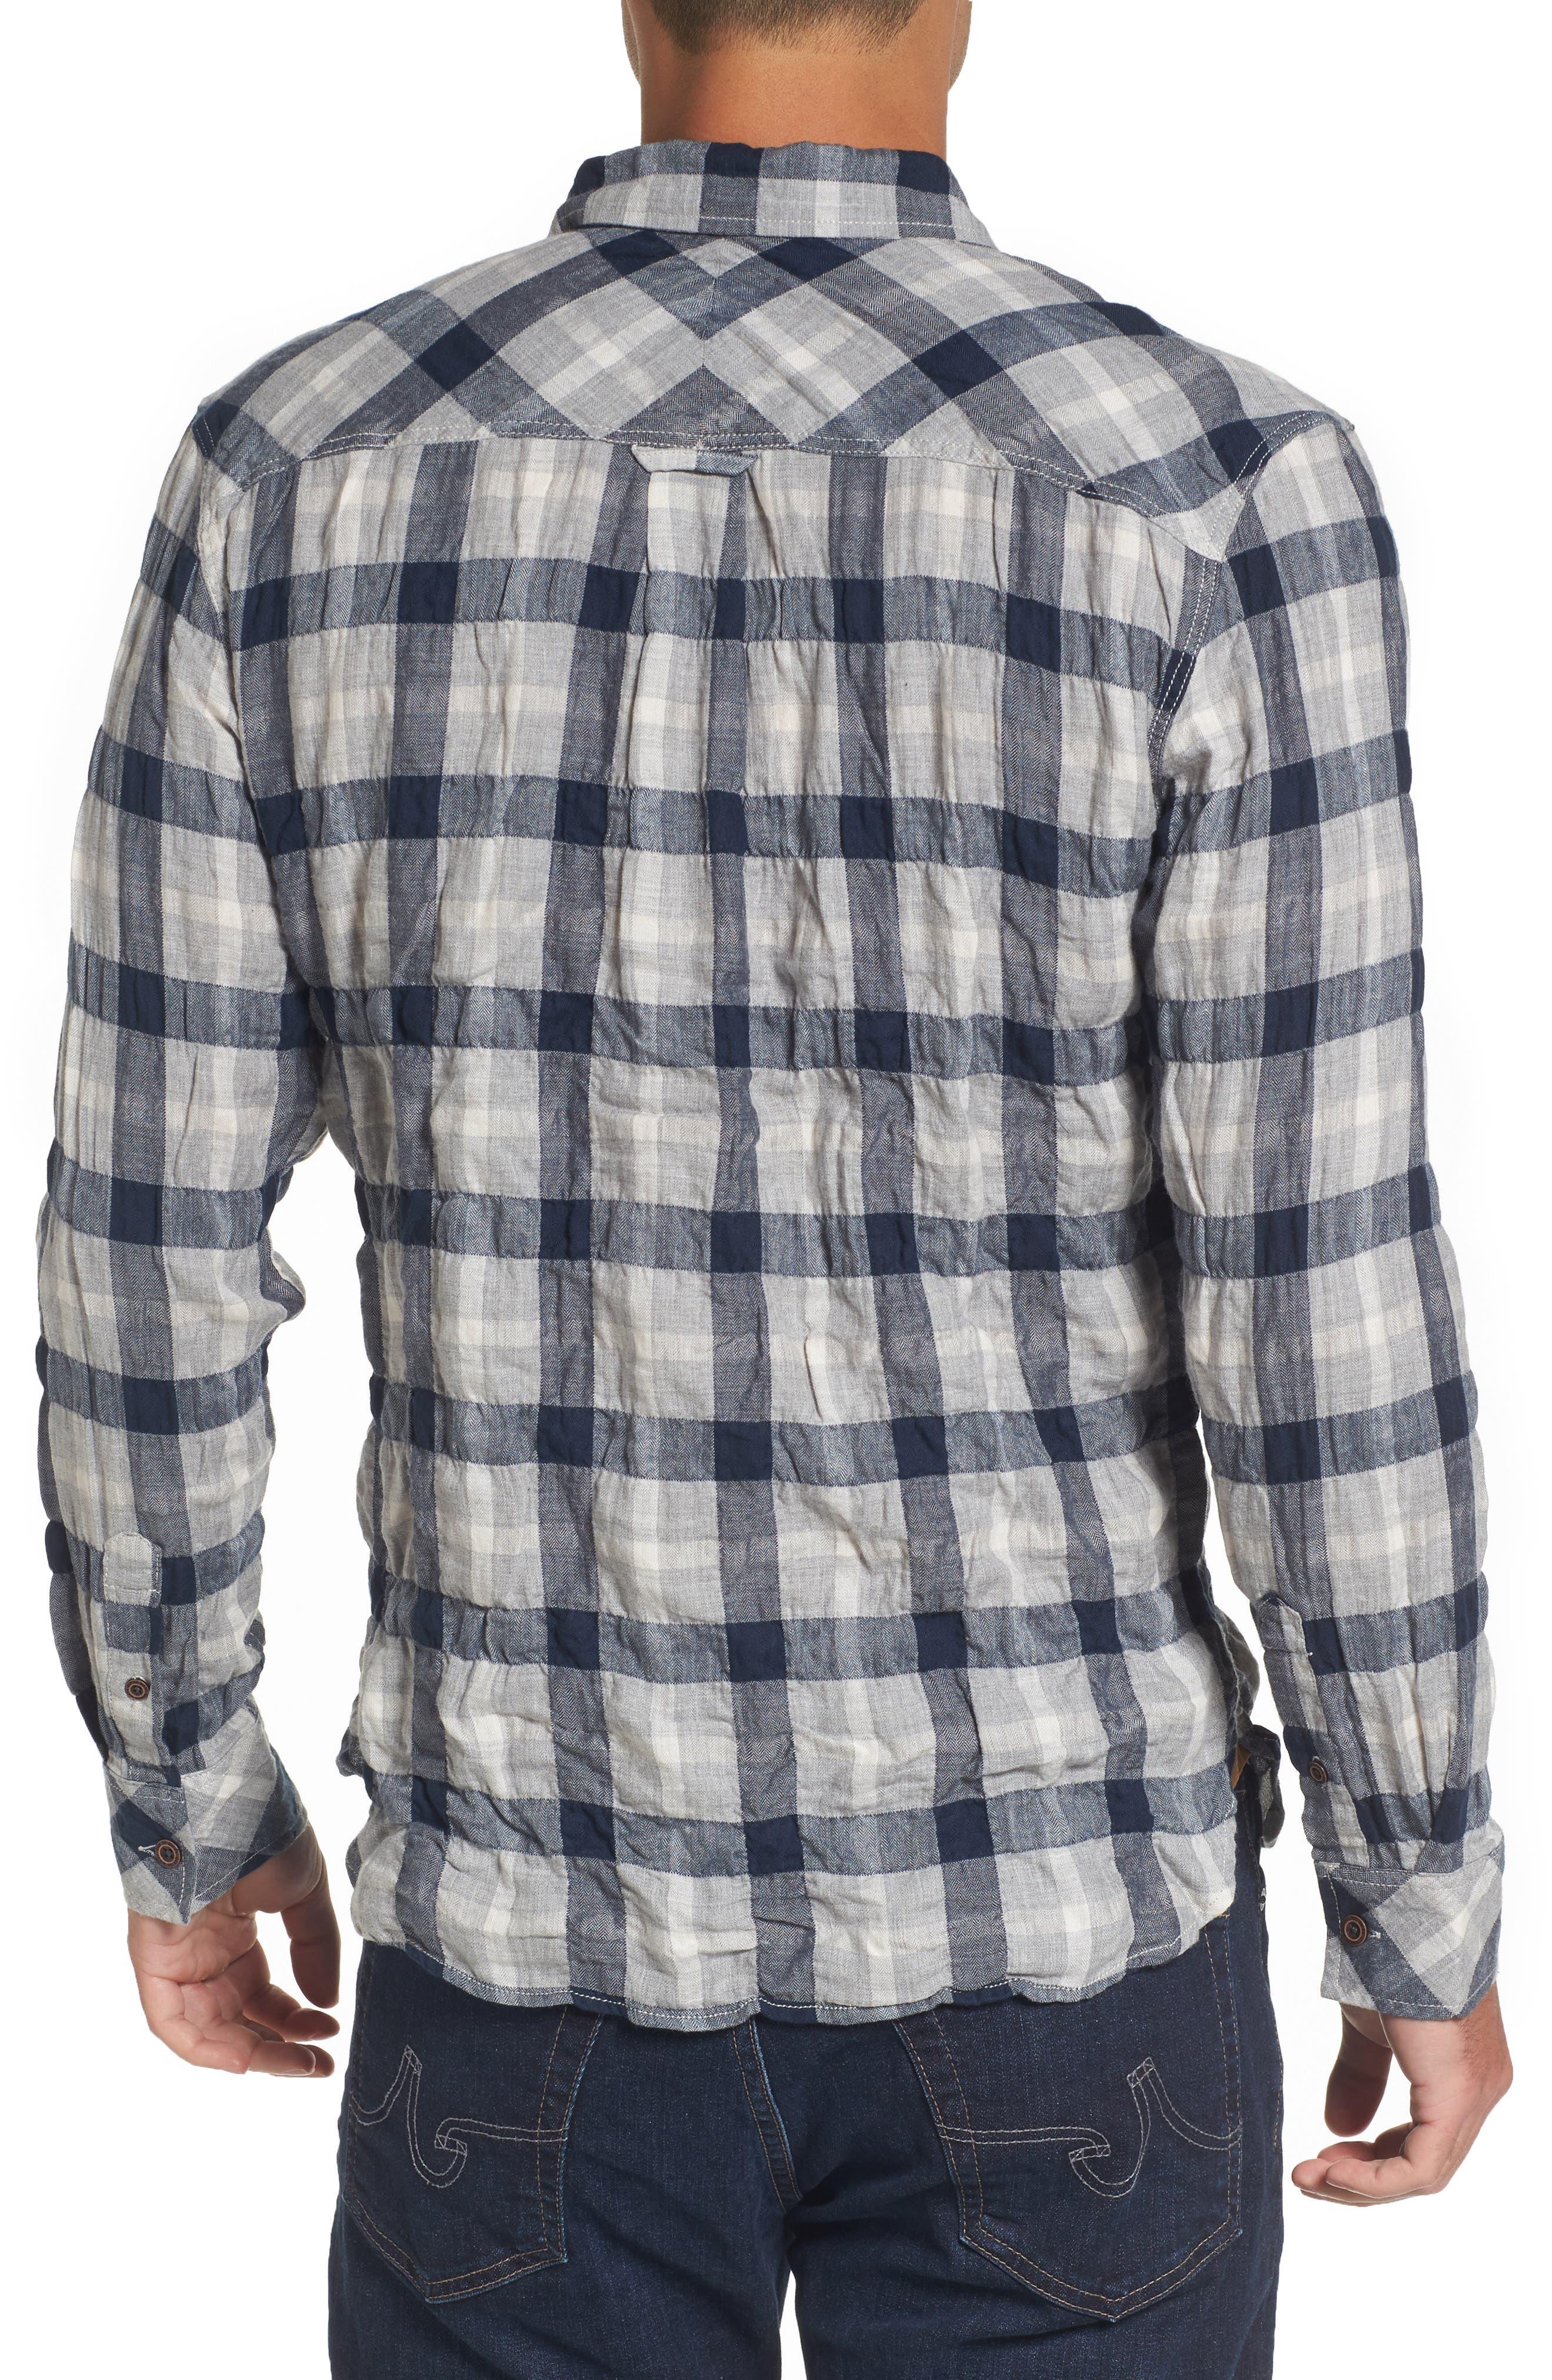 Truman Plaid Sport Shirt,                             Alternate thumbnail 2, color,                             Gray/ Navy/ White